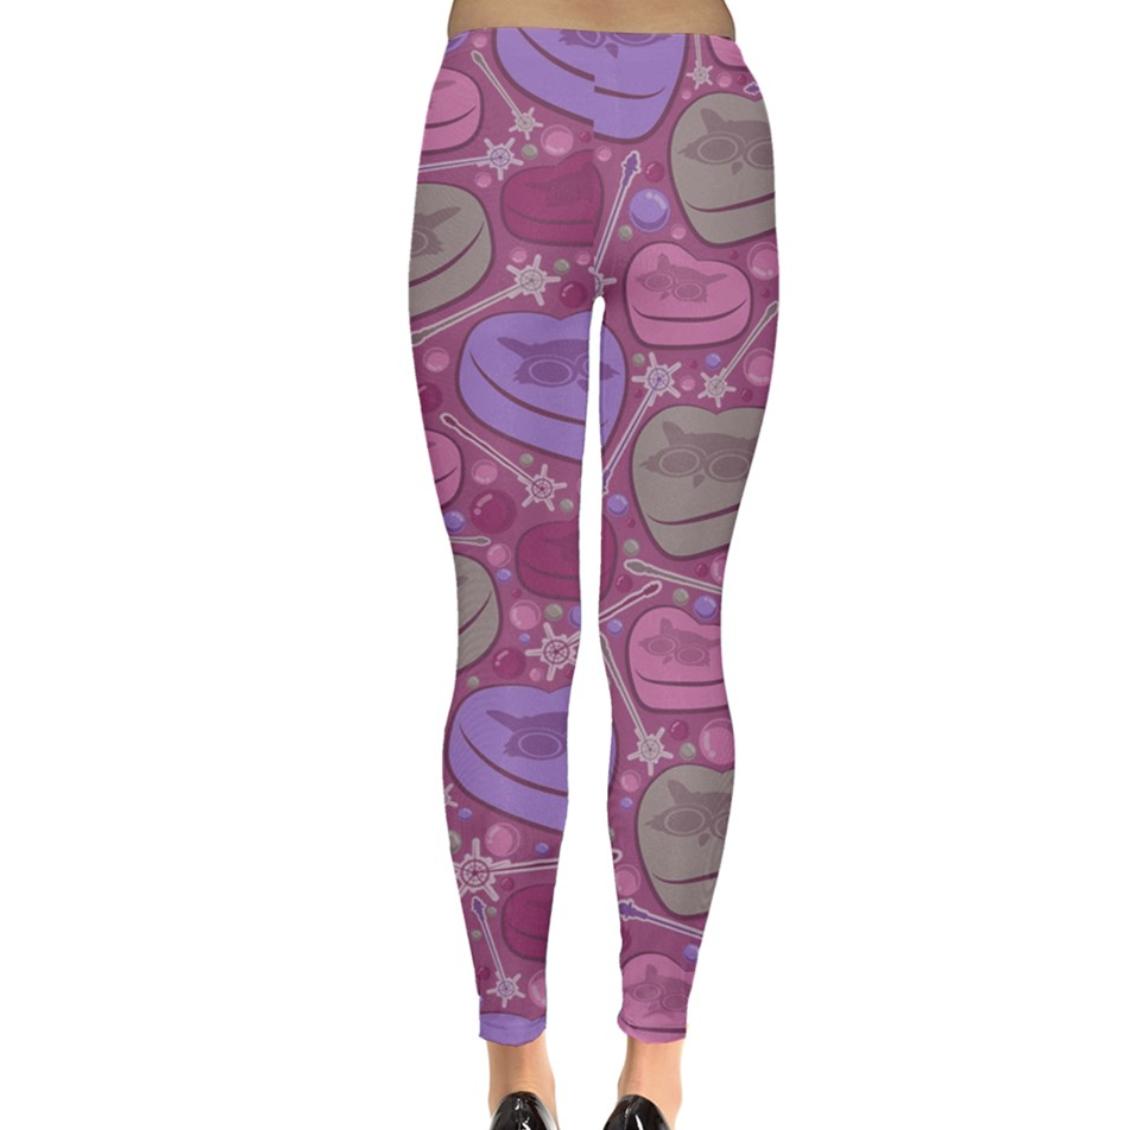 Charmed Leggings (Pink Patterned)